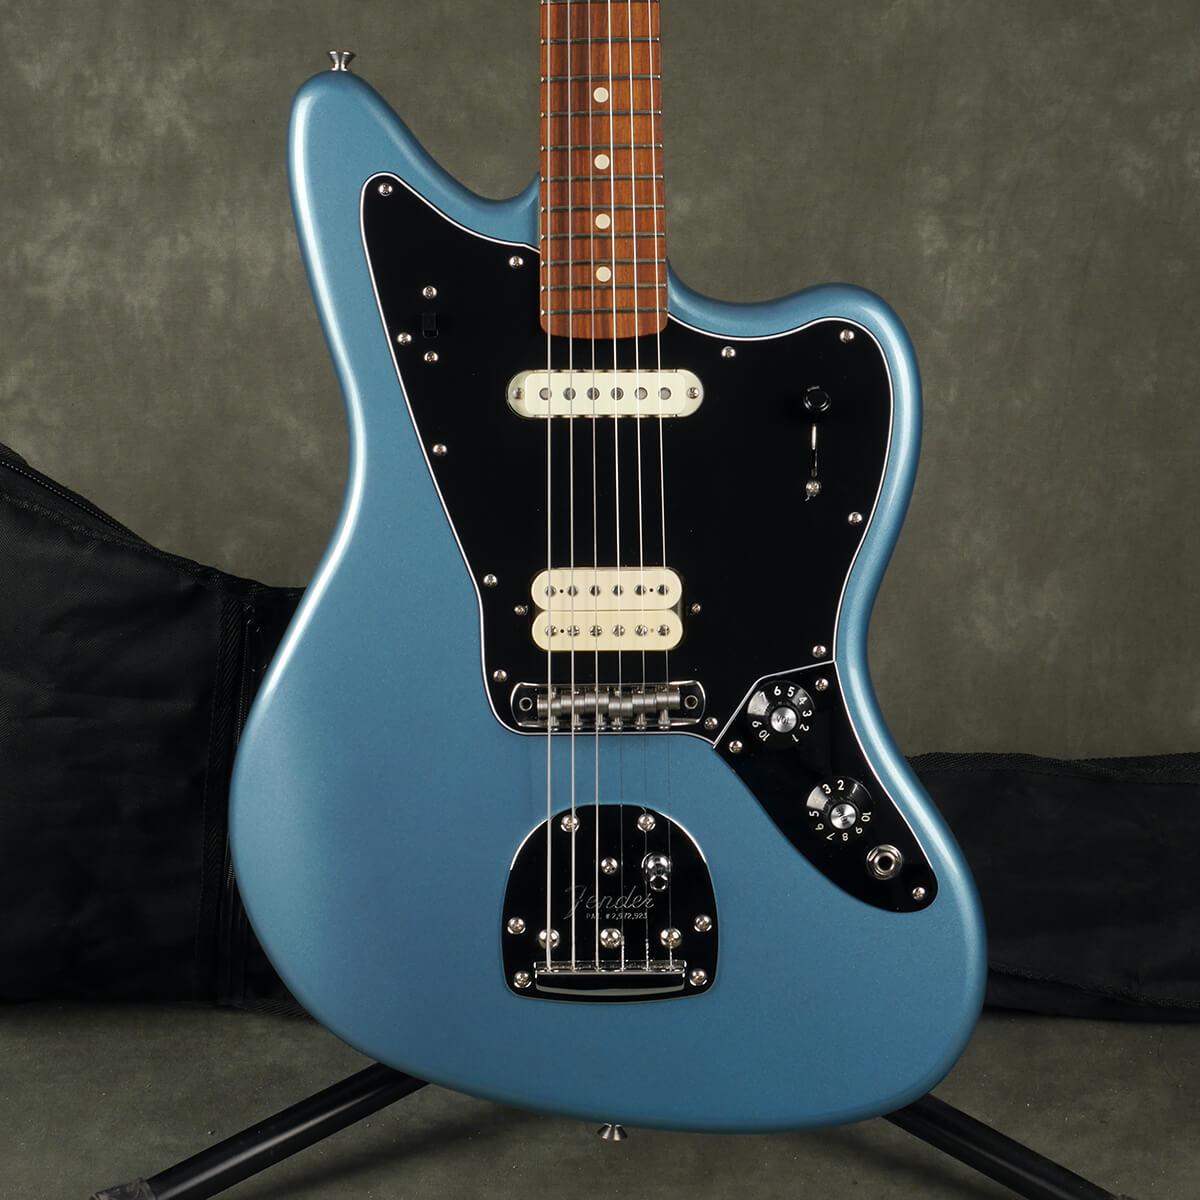 Fender Player Series Jaguar - Tidepool w/Gig Bag - 2nd Hand